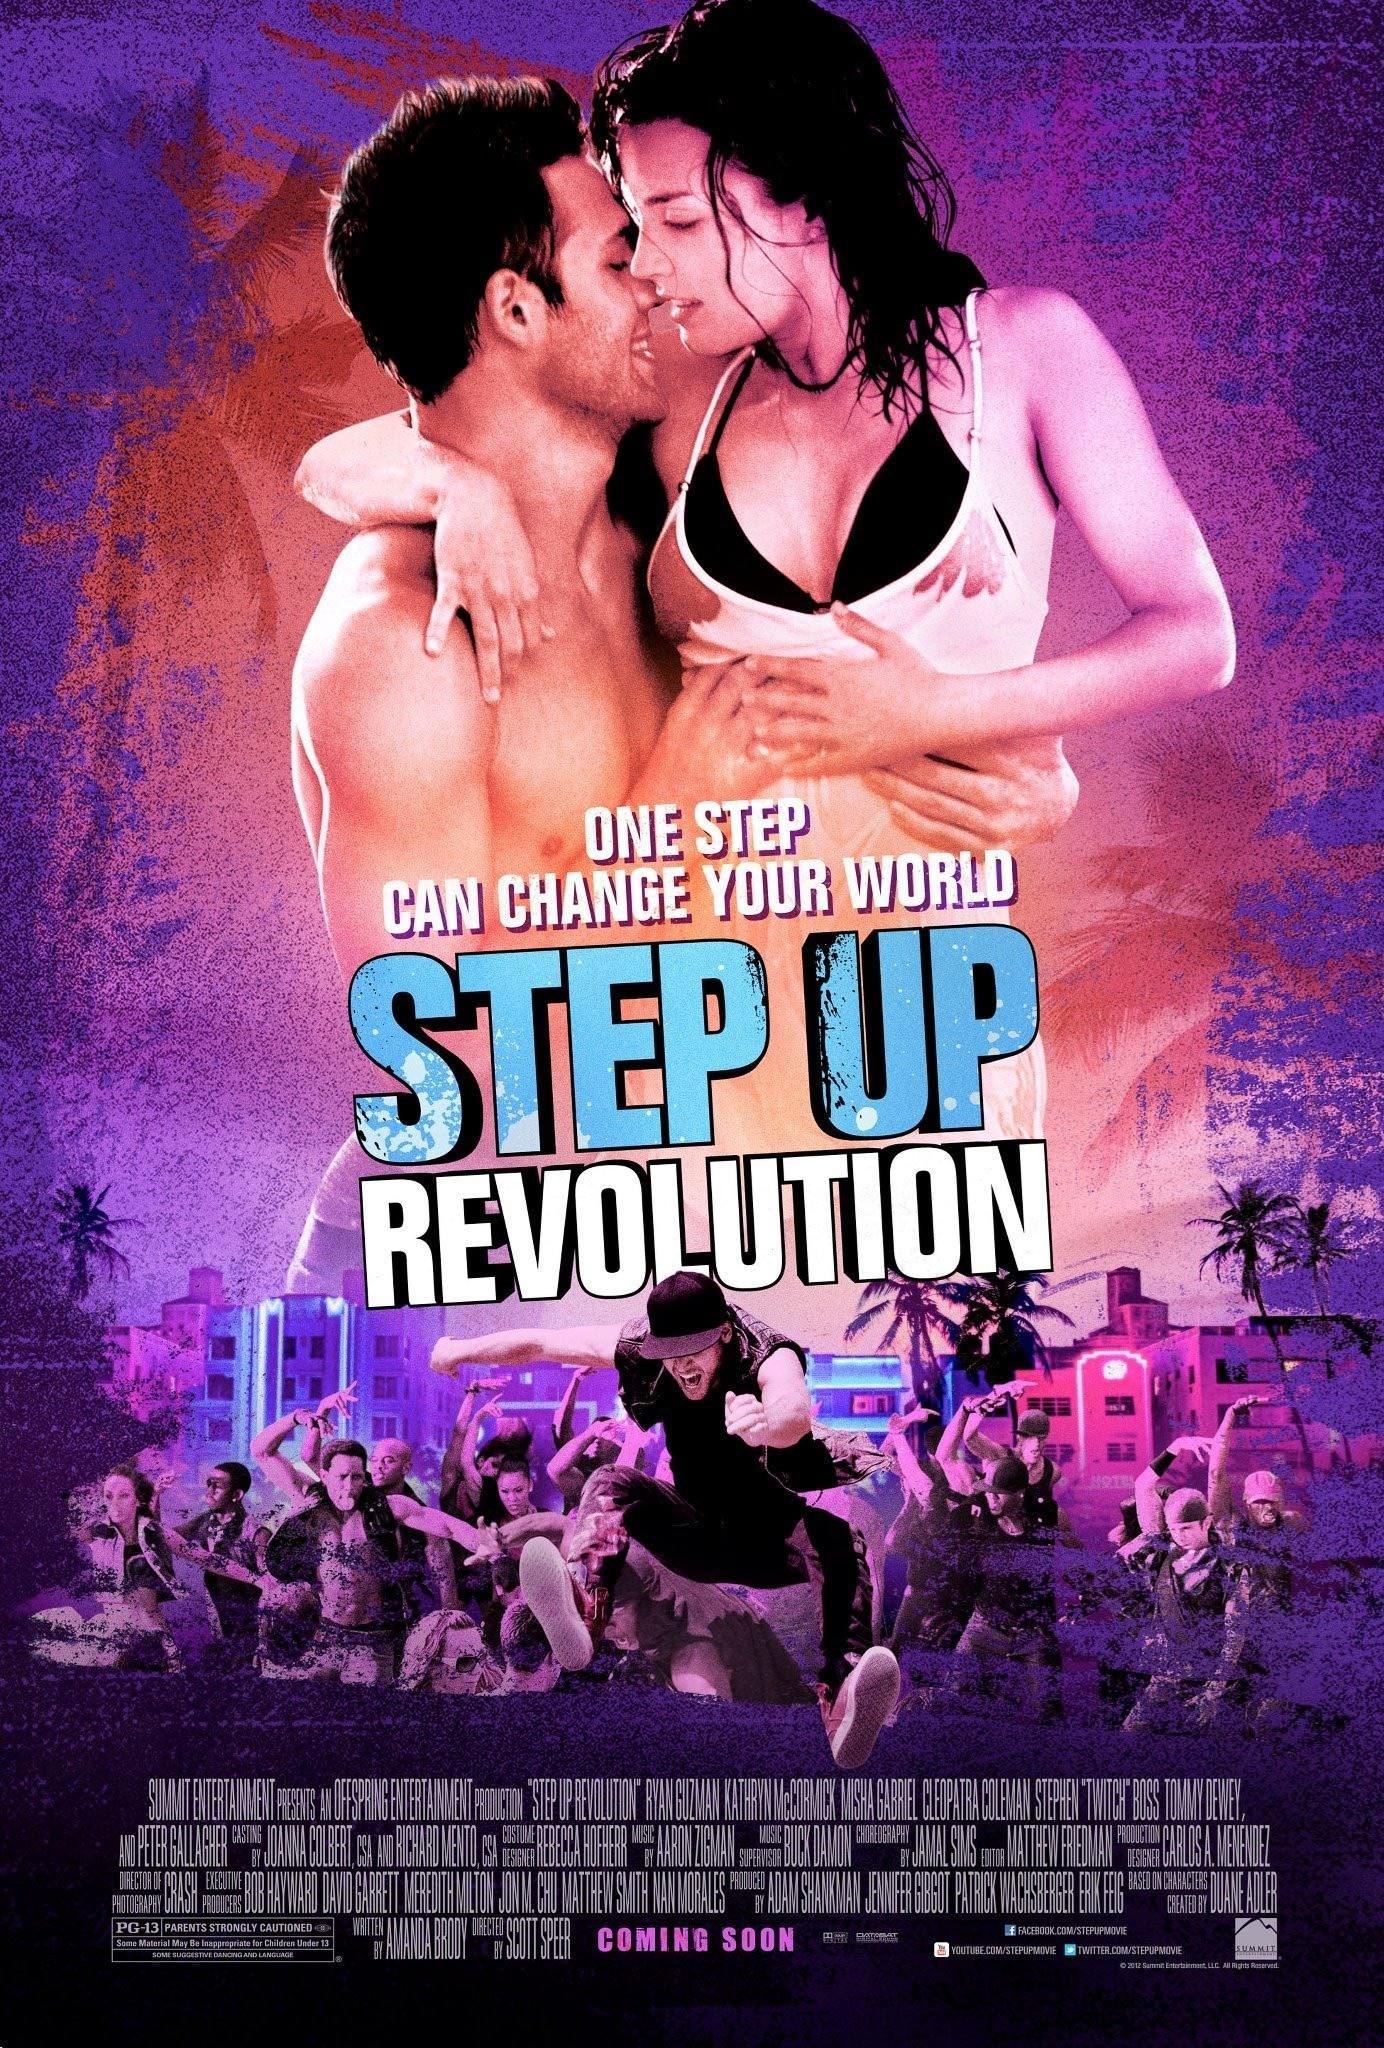 Step up revolution 2012 dual audio brrip 720p hd | dualdl. Com.